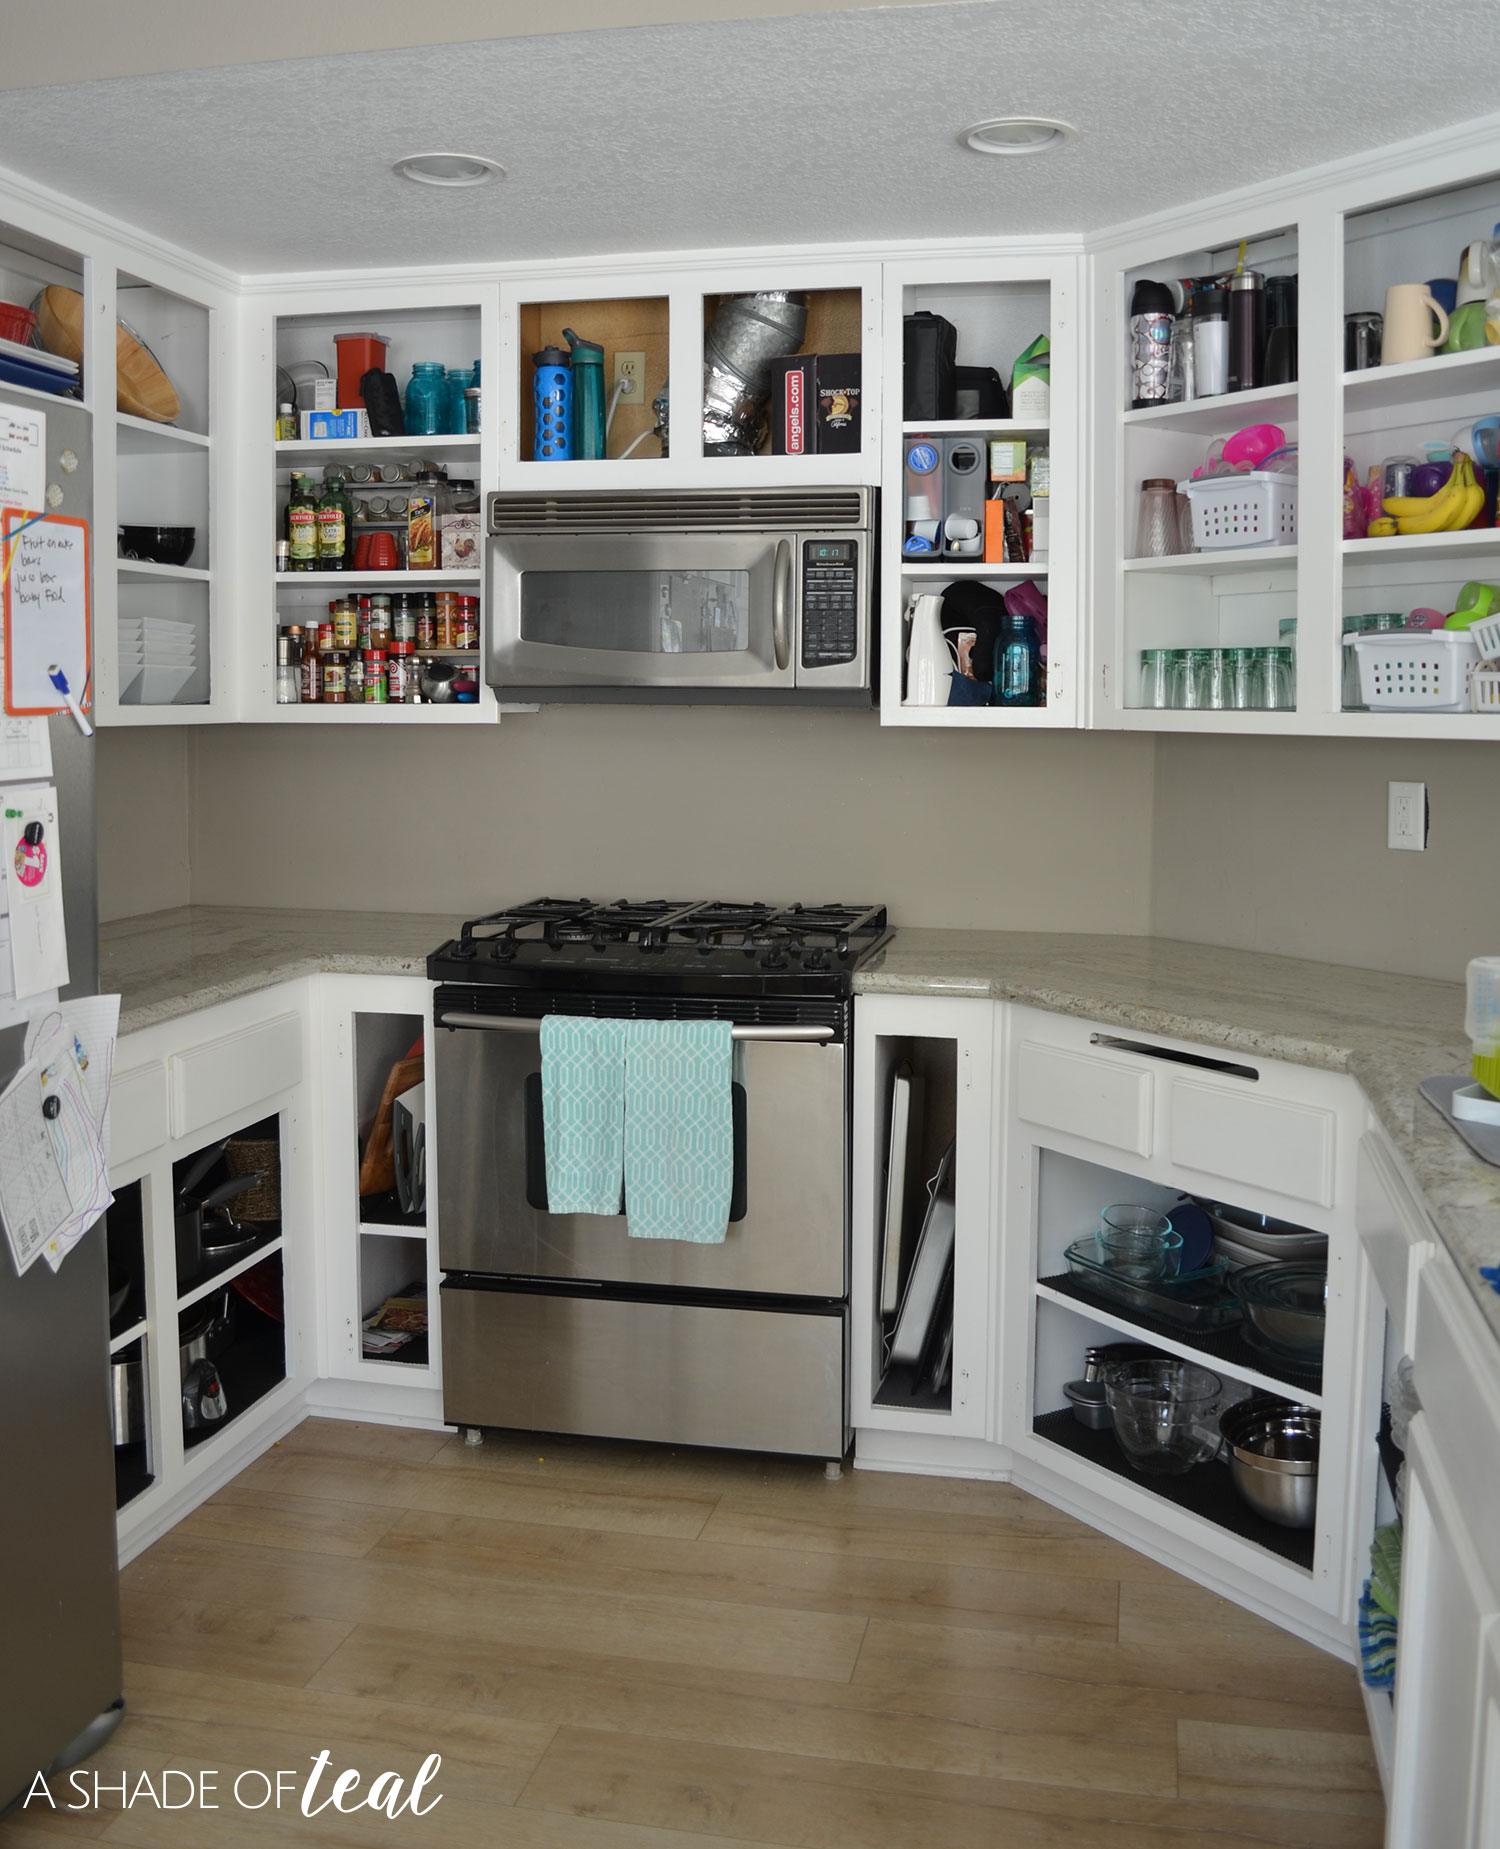 Modern Rustic Kitchen Makeover // ORC Week-2: Inspiration